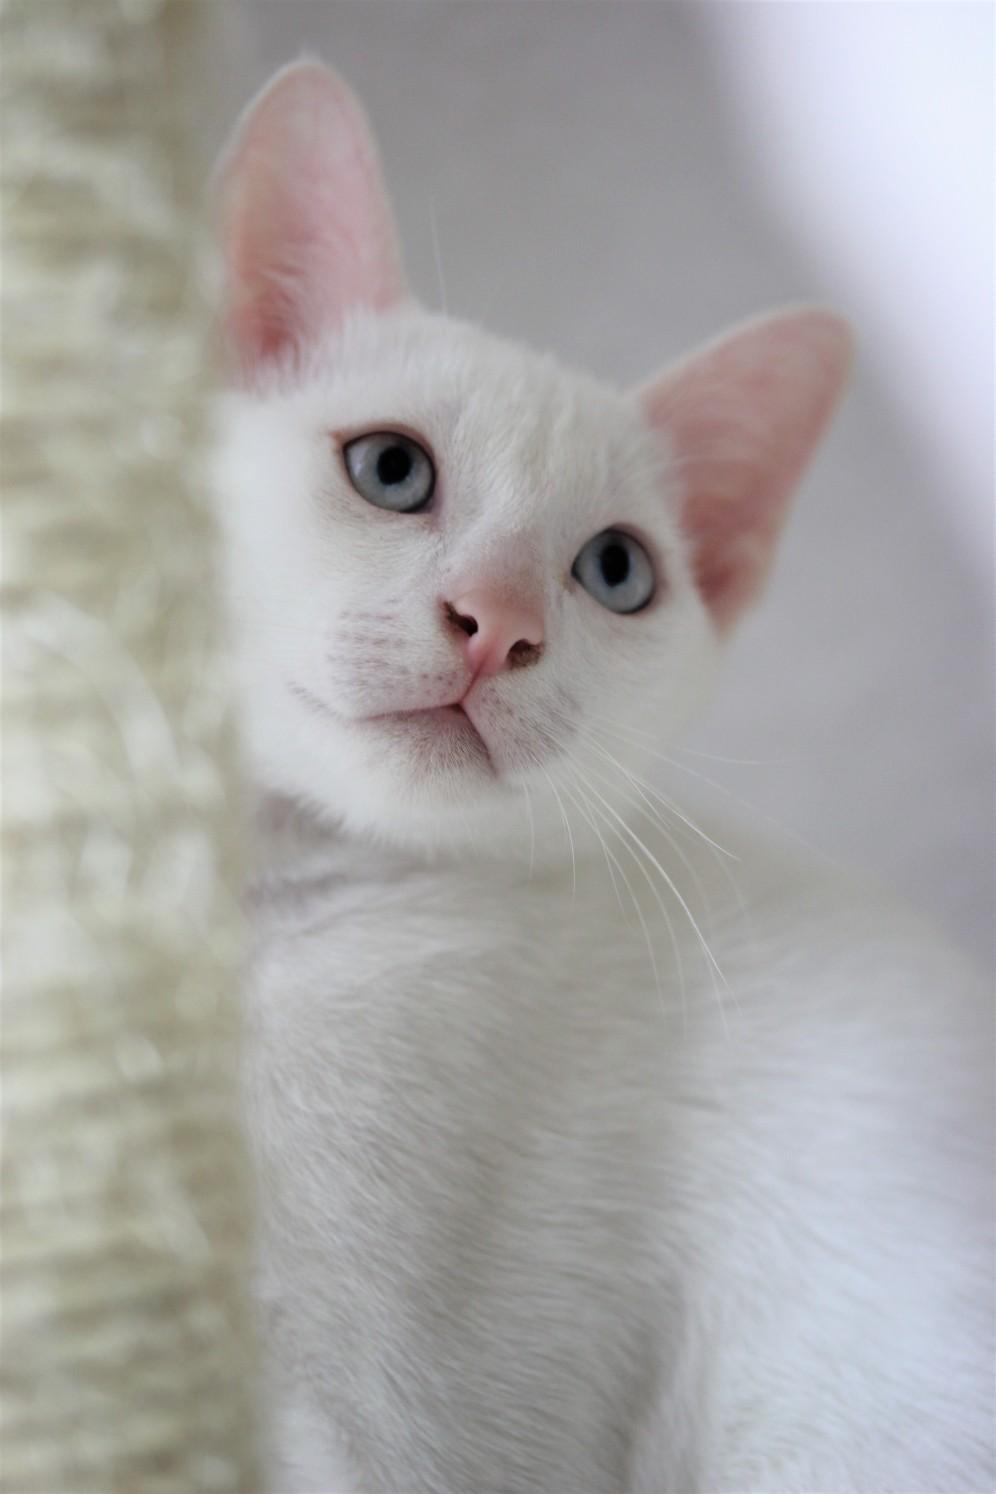 khao manee kitten barcelona gatito - Giovanni 05